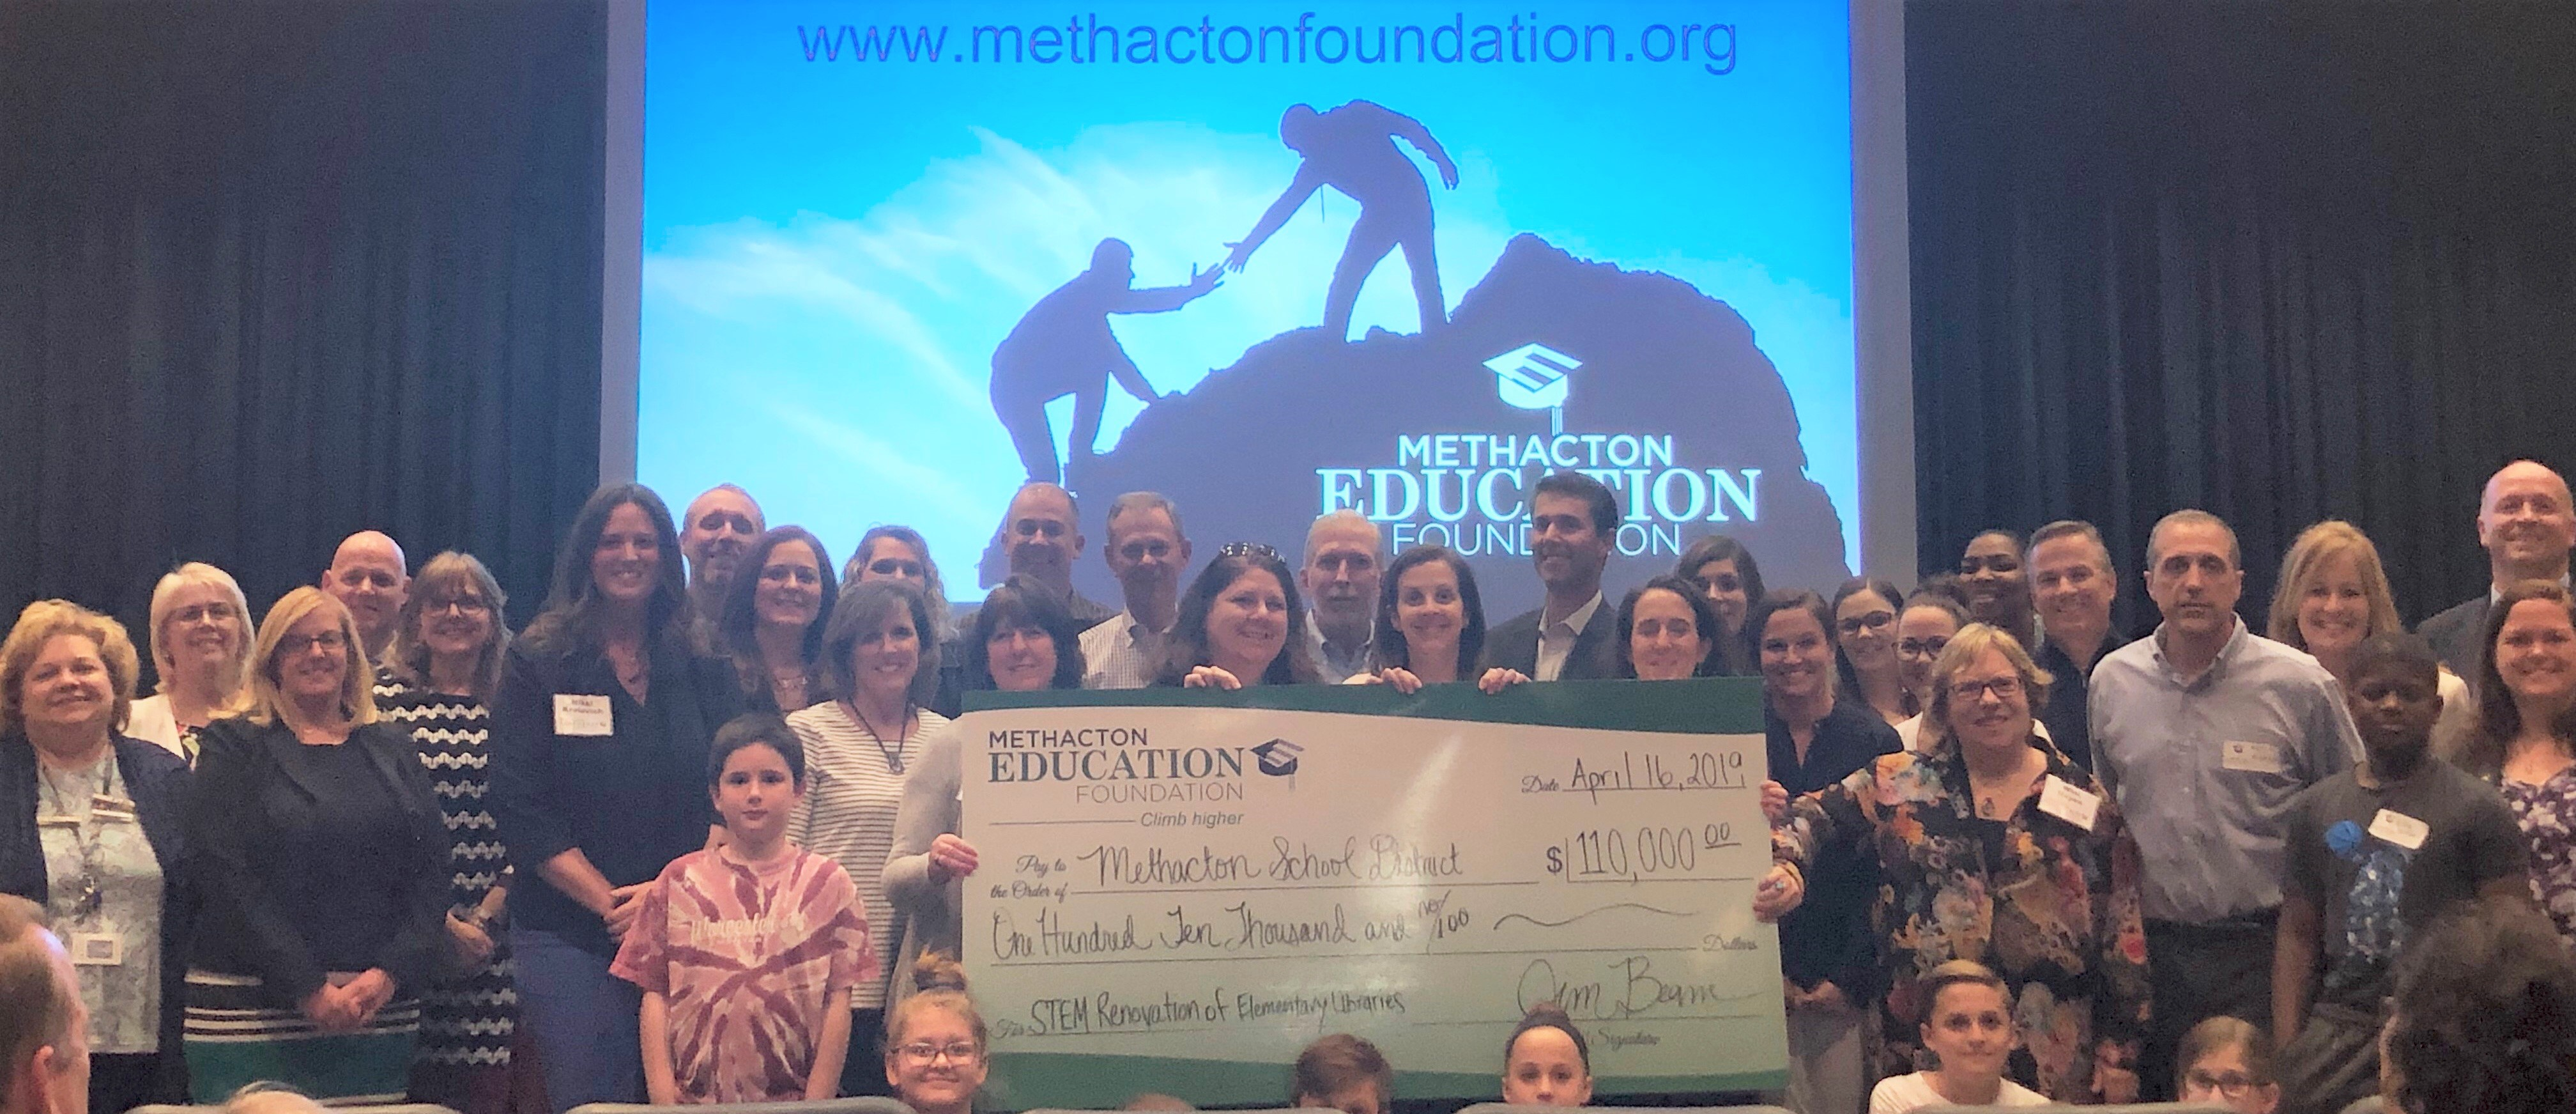 Foundation donates $110,000 for STEM in Methacton